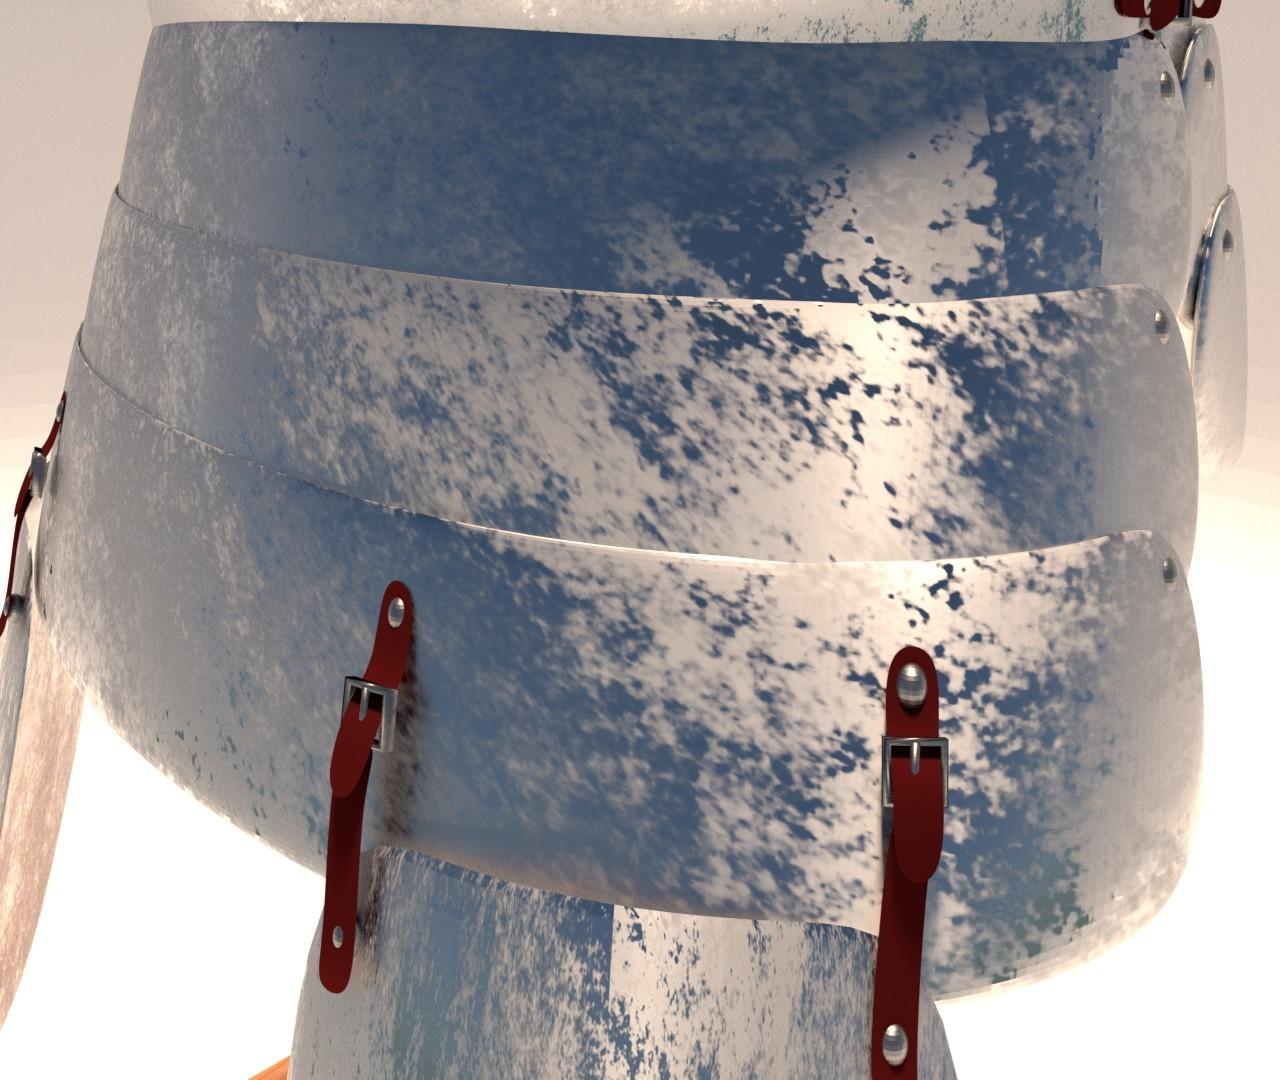 Cuirass - Sideview Detail 2